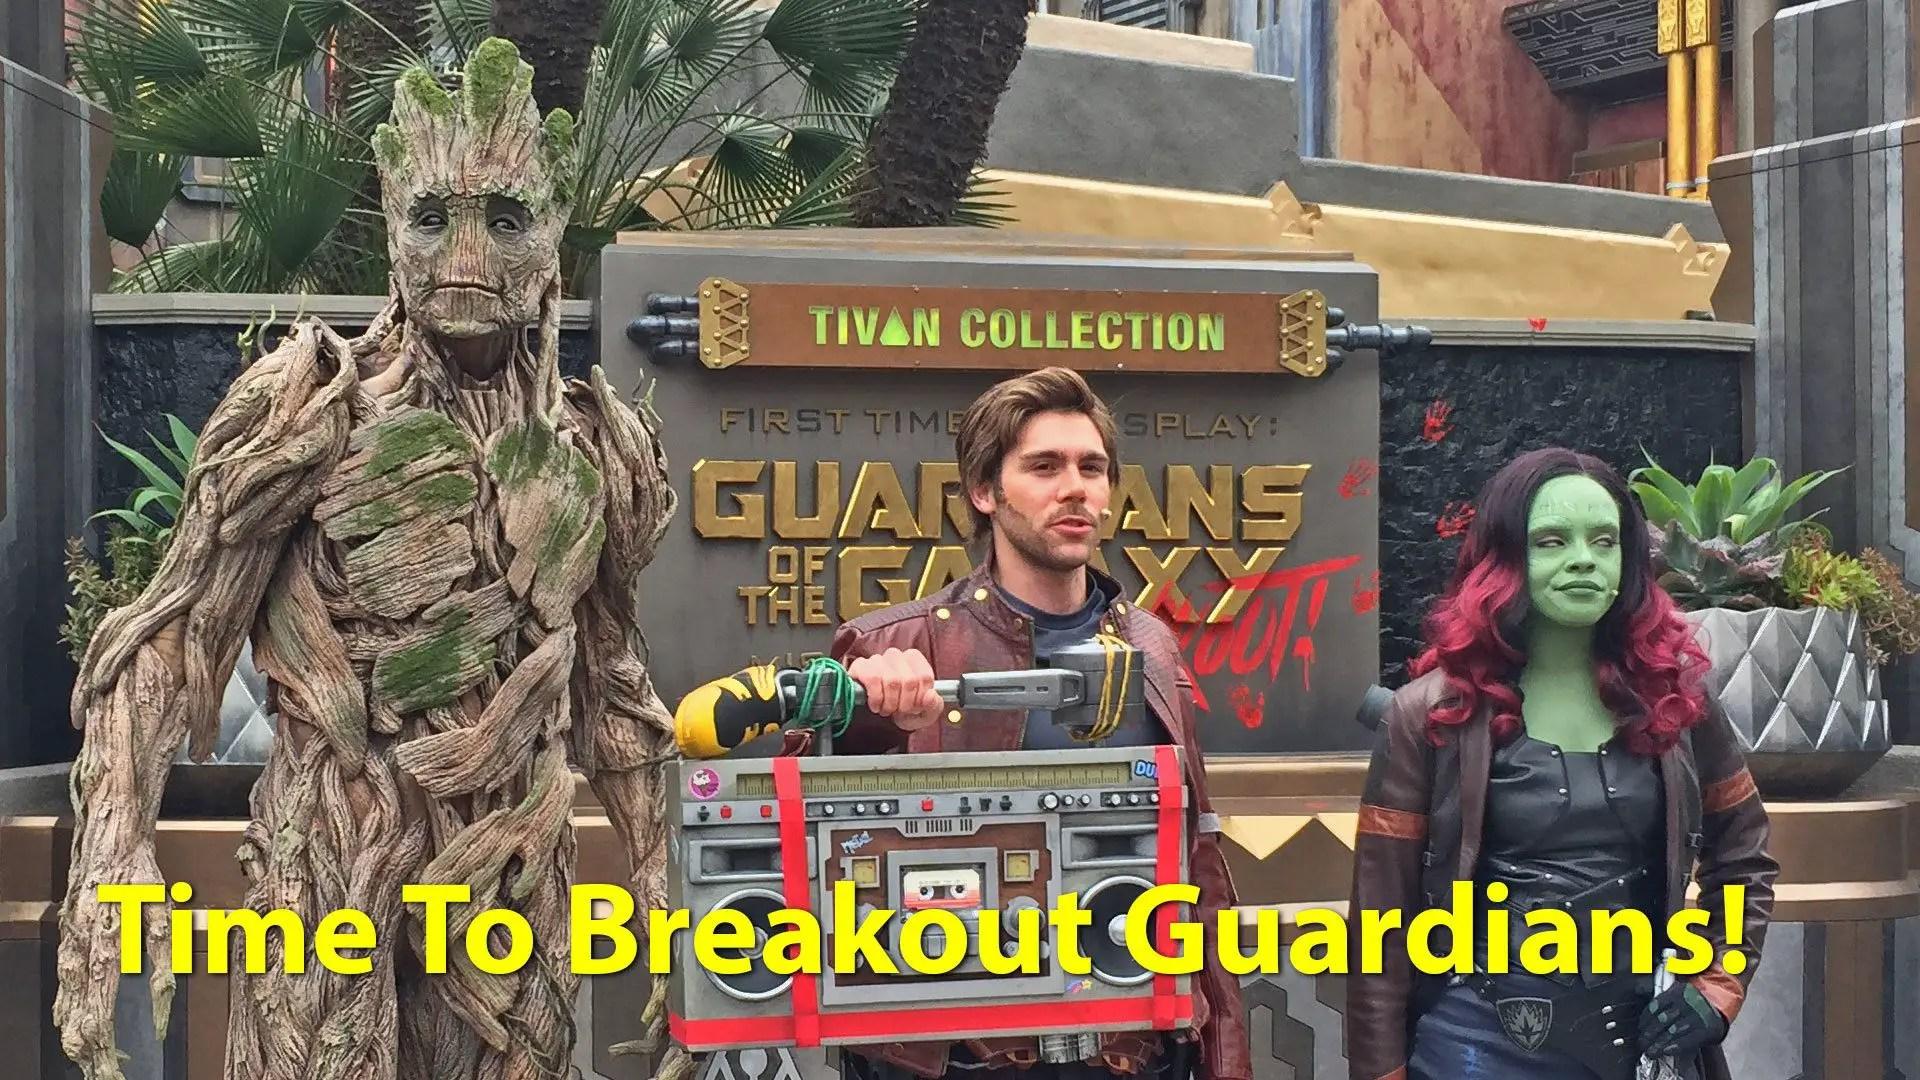 Time to Breakout Guardians! - Geeks Corner - Episode 635